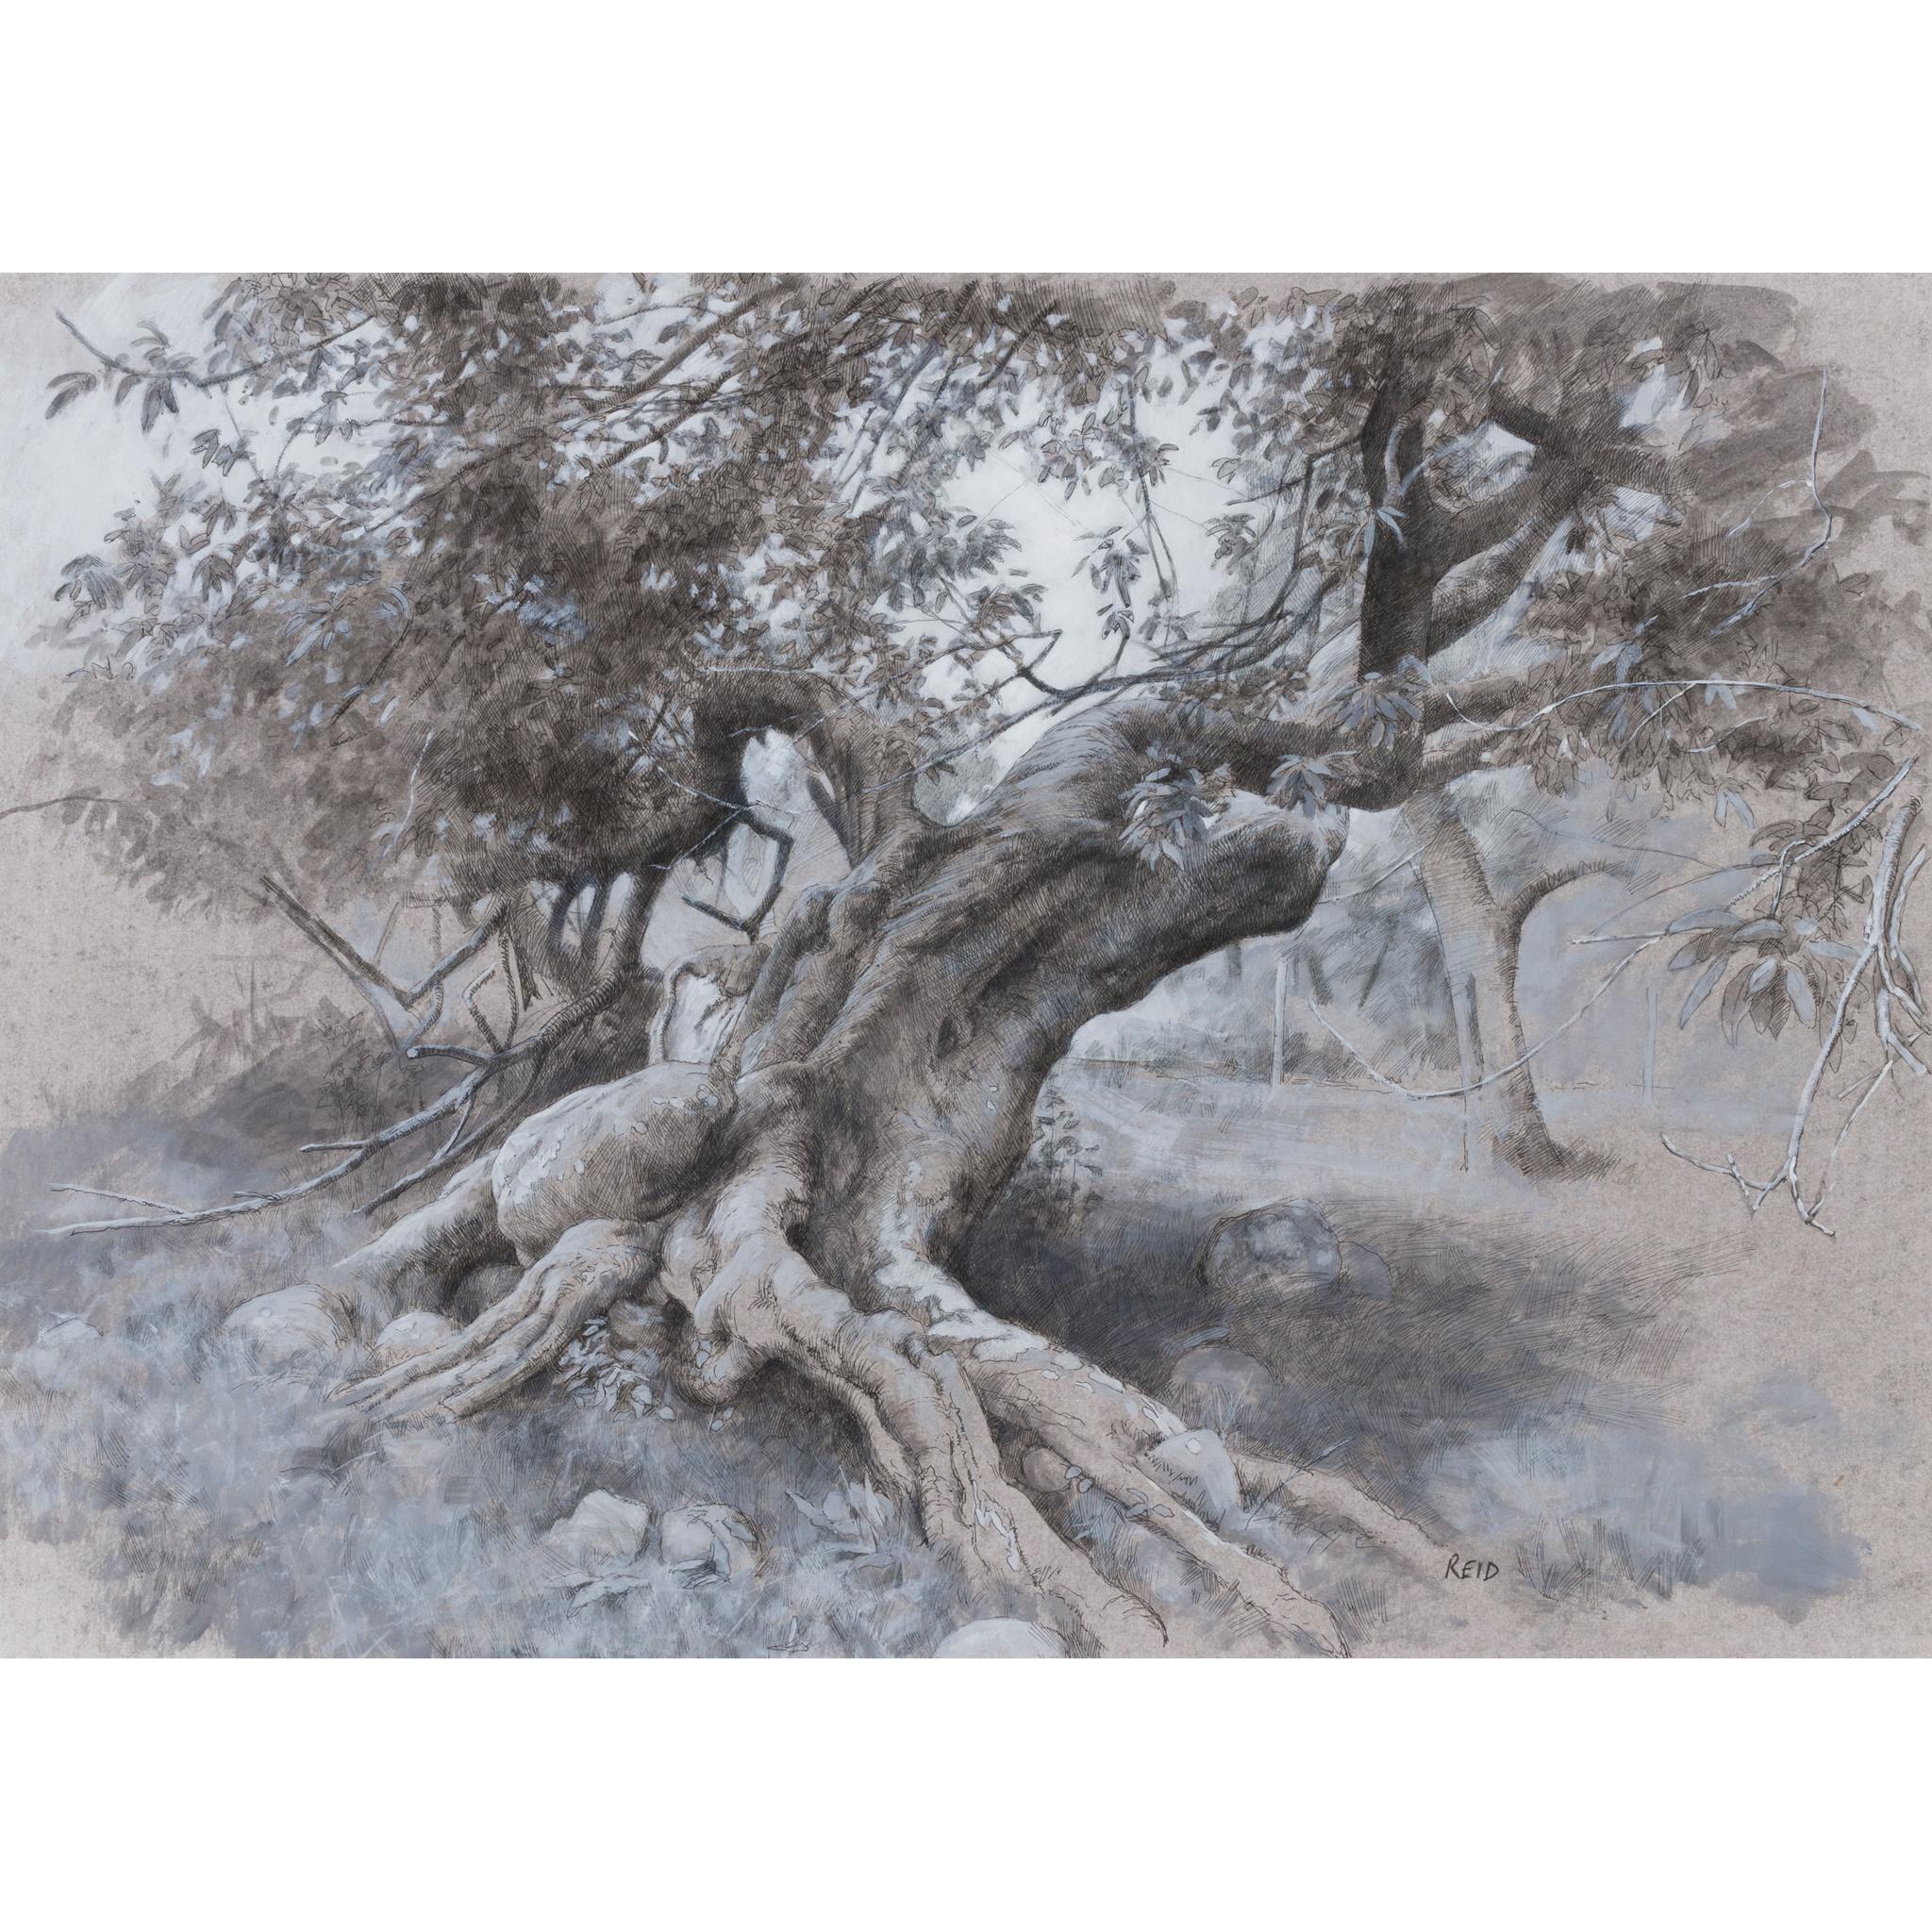 § PAUL REID (SCOTTISH B.1975) TREES - LOCH NESS